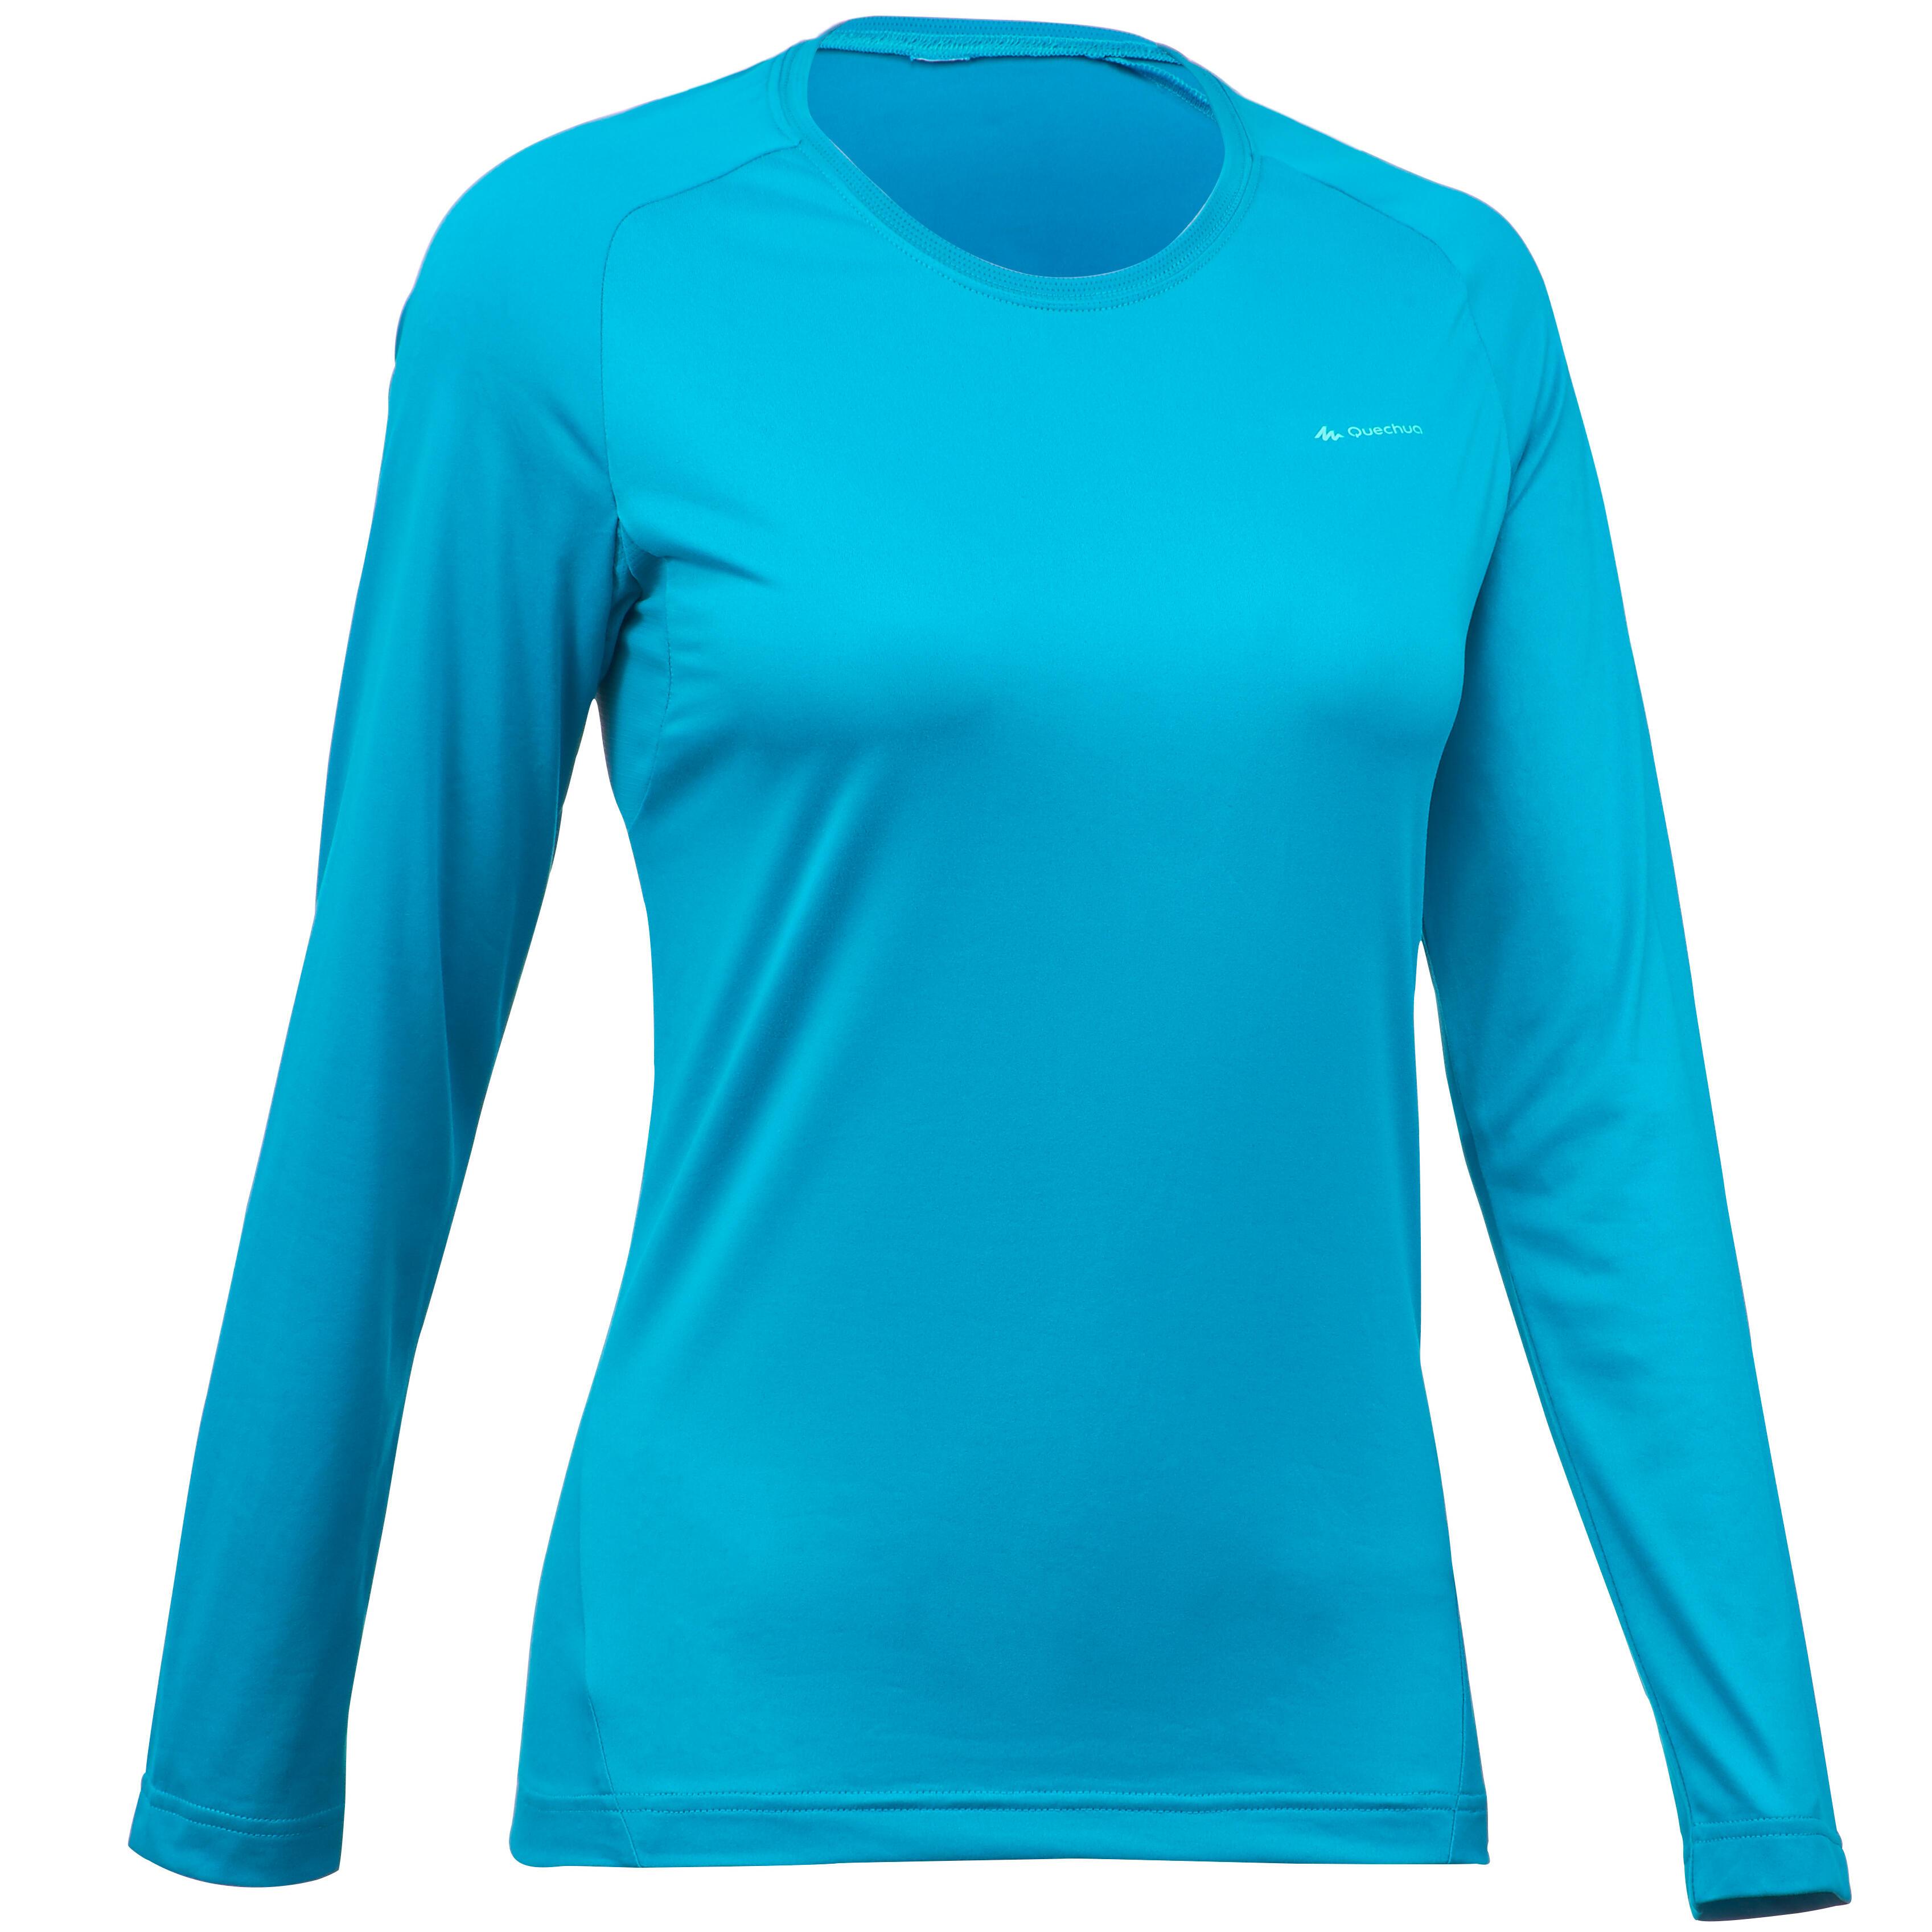 MH150 Women's Long Sleeved Mountain Hiking T-Shirt - Turquoise